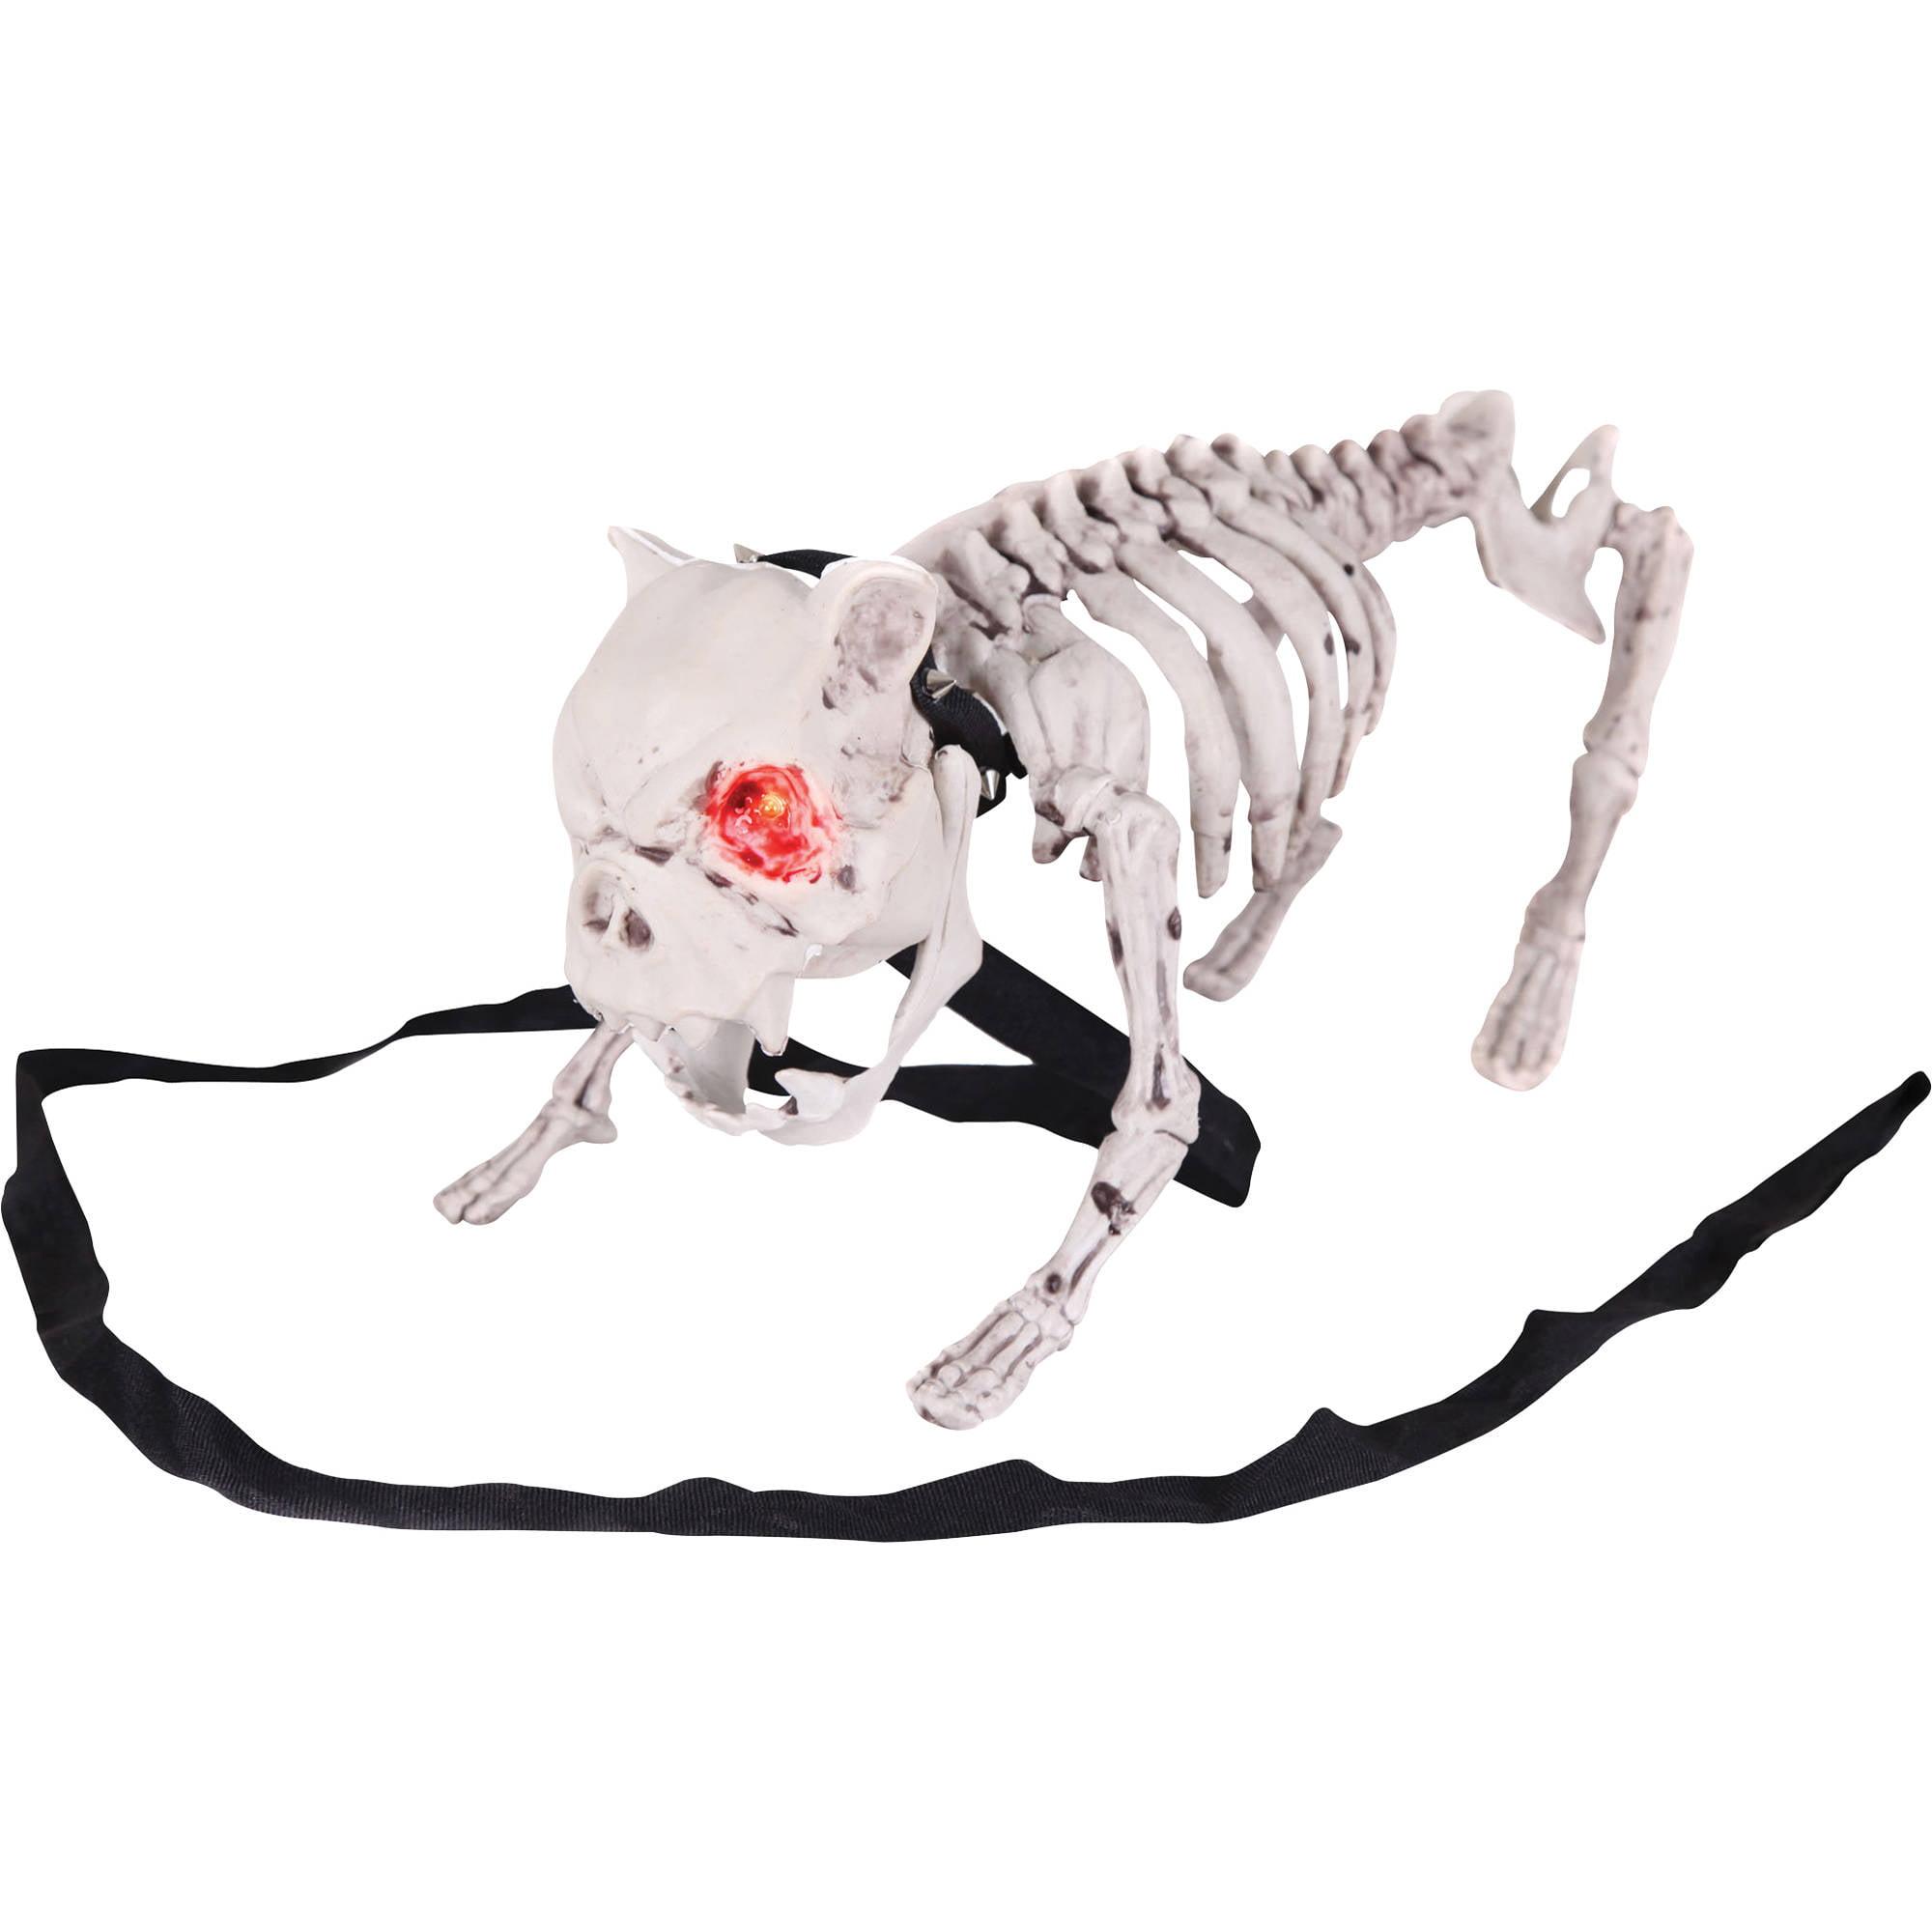 barking dog skeleton halloween decoration - walmart